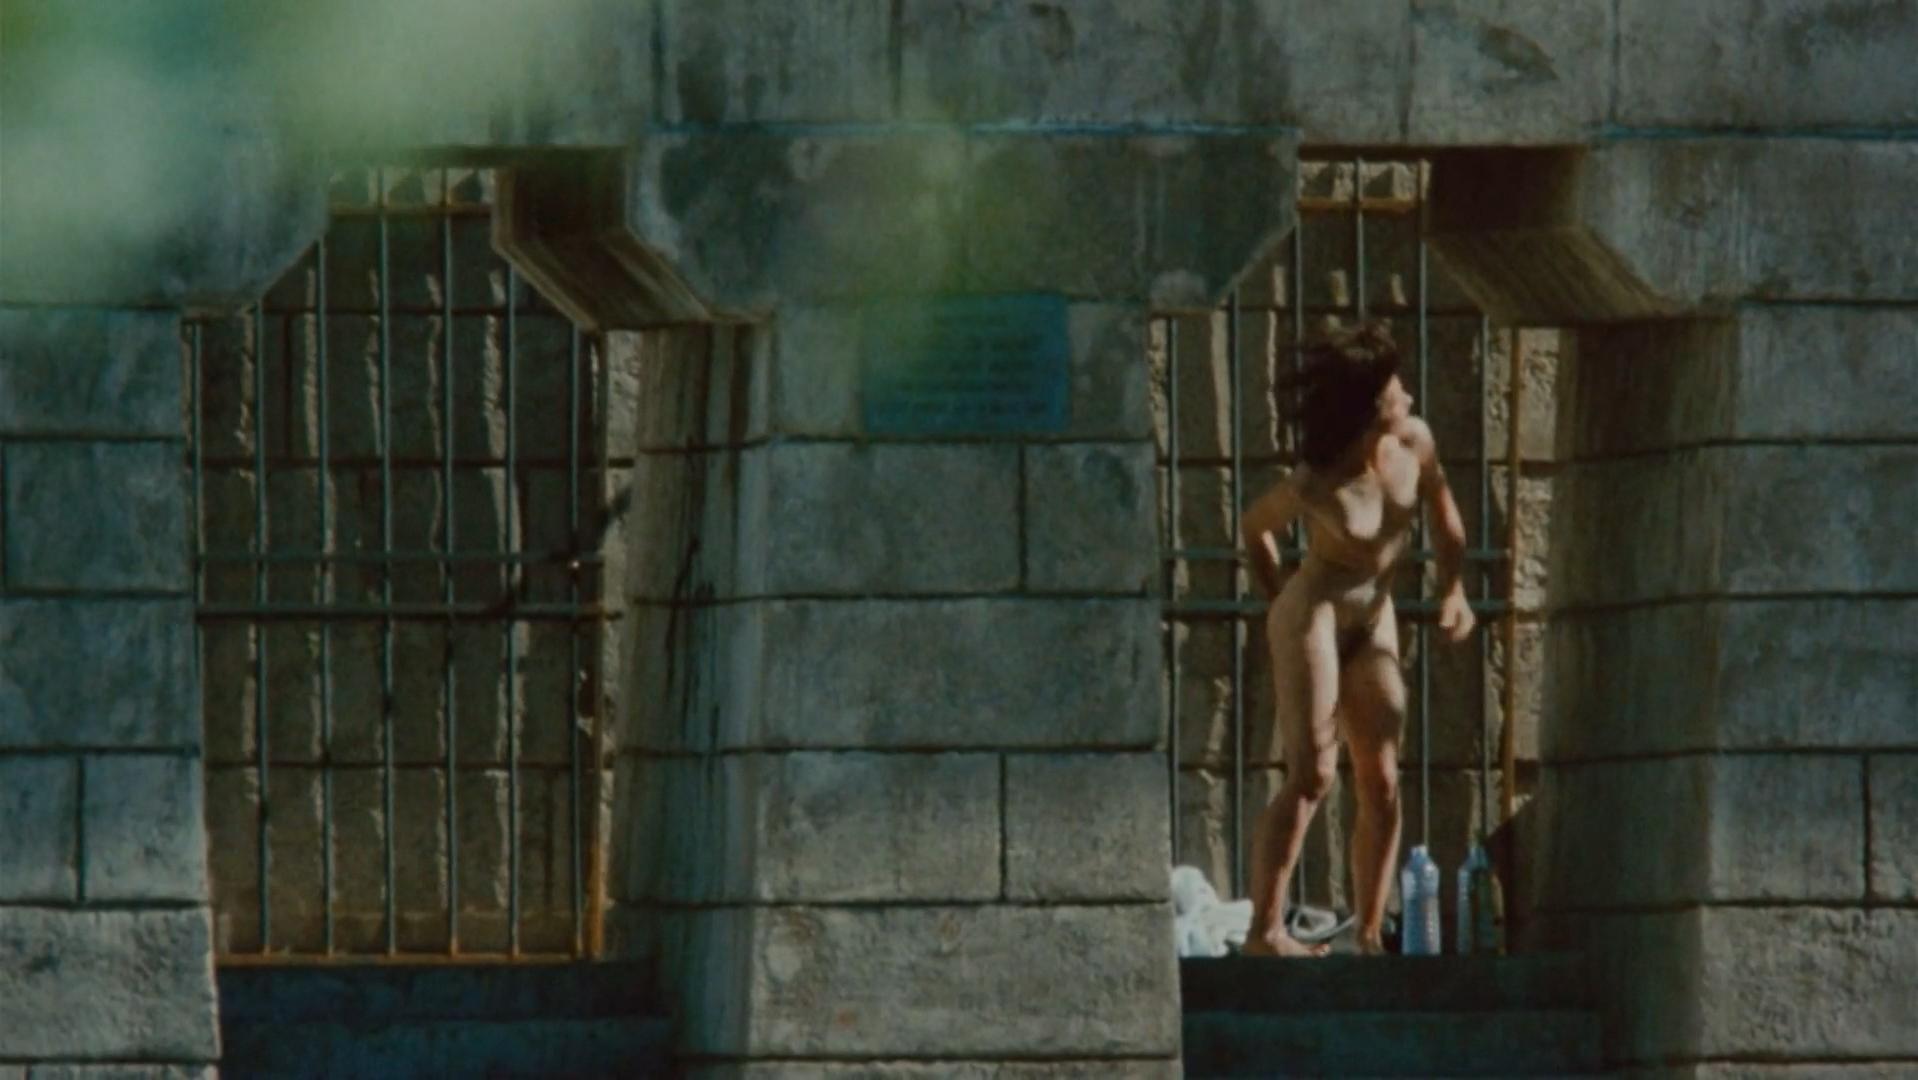 Juliette Binoche nude - Les amants du Pont-Neuf (1991)